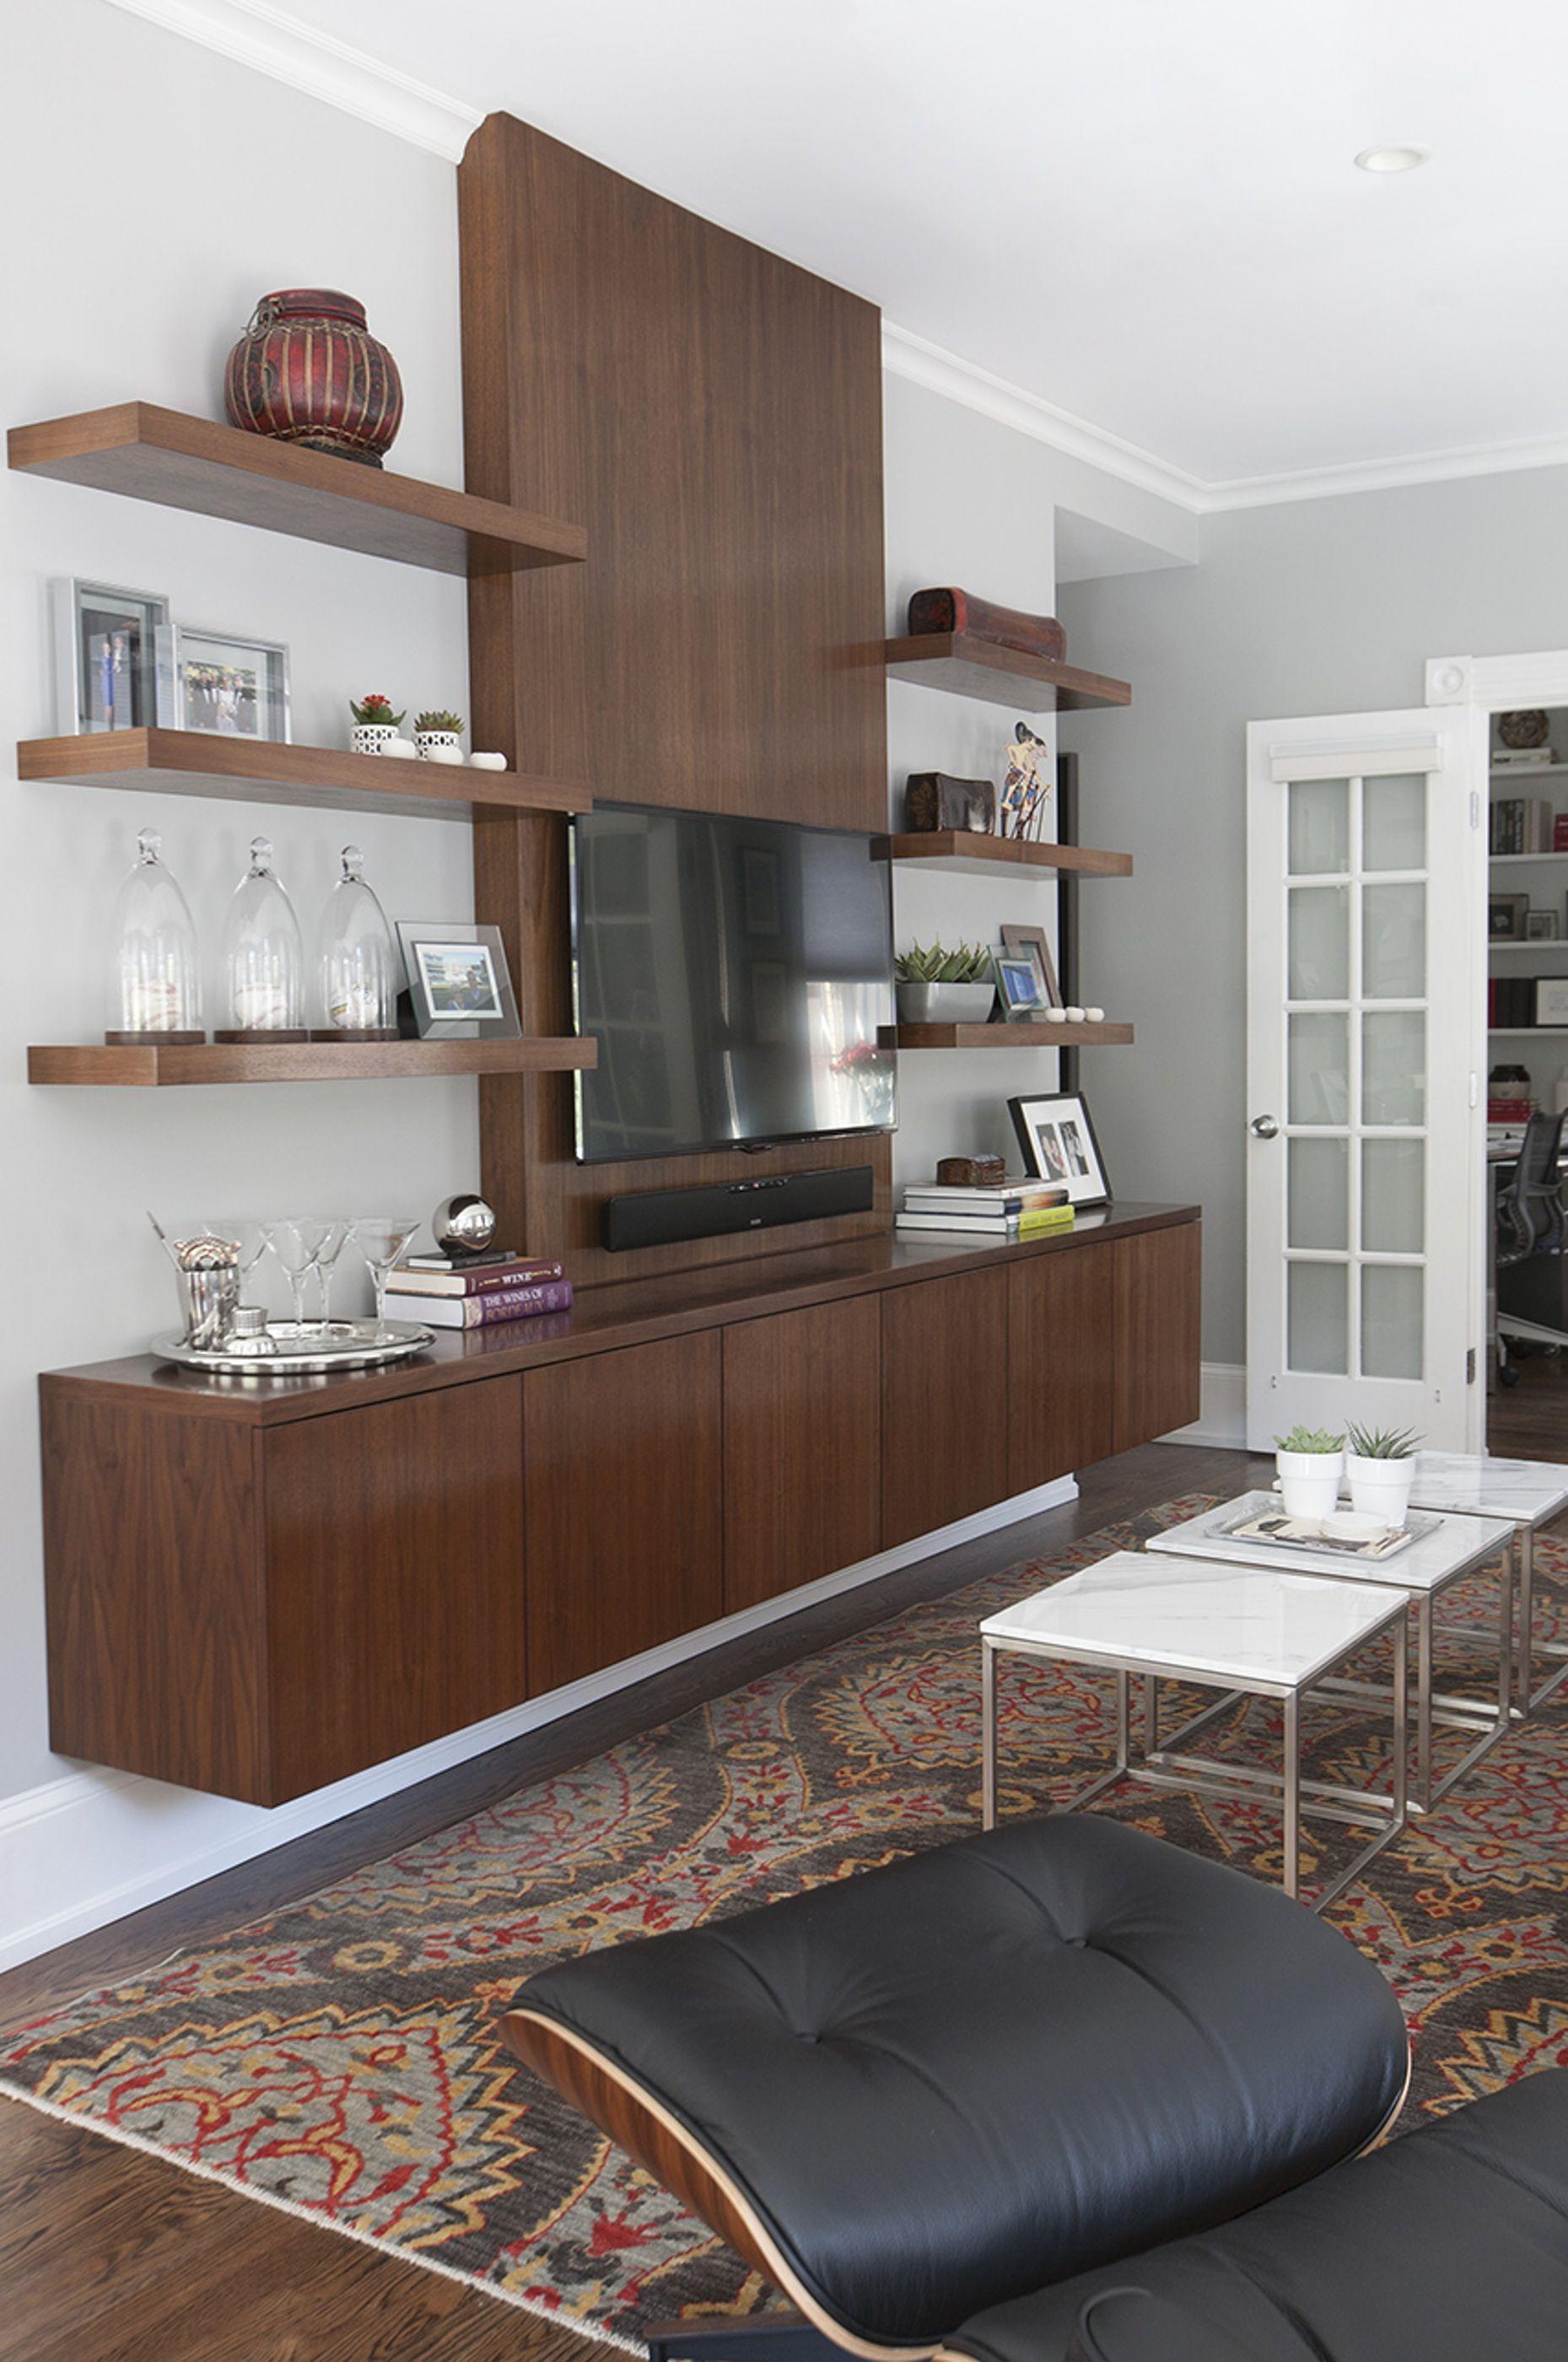 Justine sterling design portfolio interiors stylesg ixlib  drails also rh pinterest